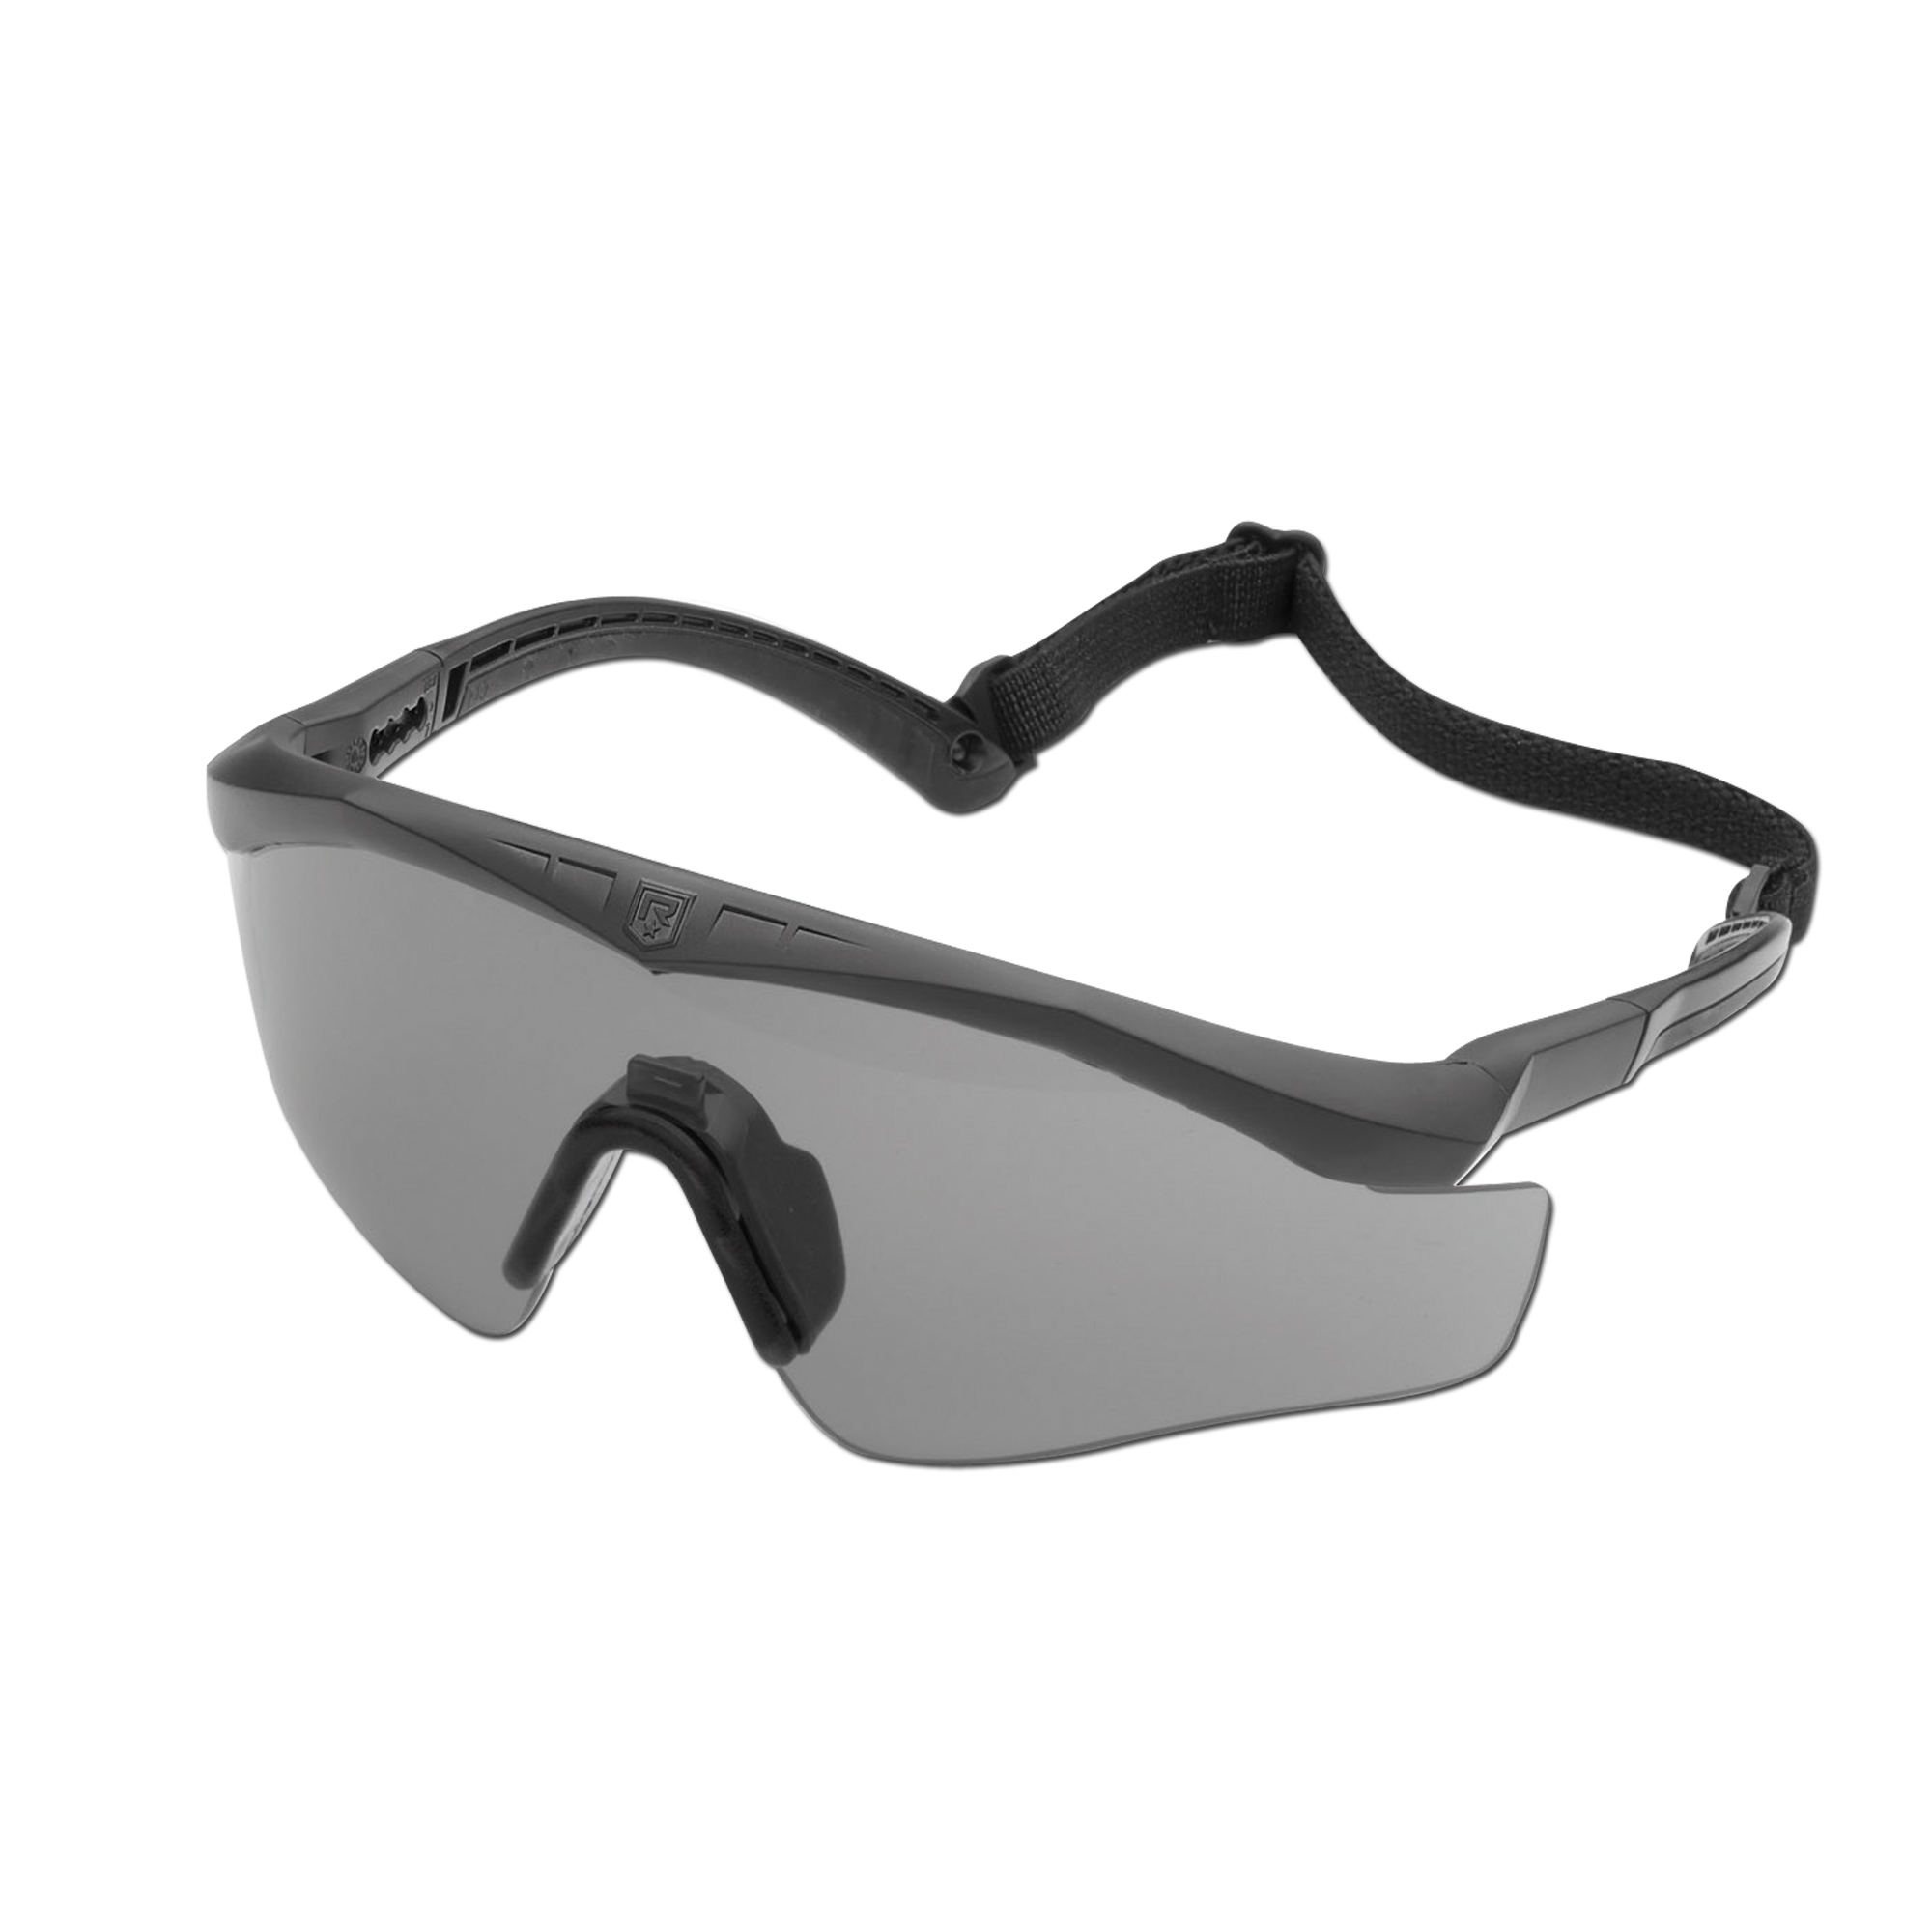 Gafas Revision Sawfly MAX-Wrap set básico smoke grande